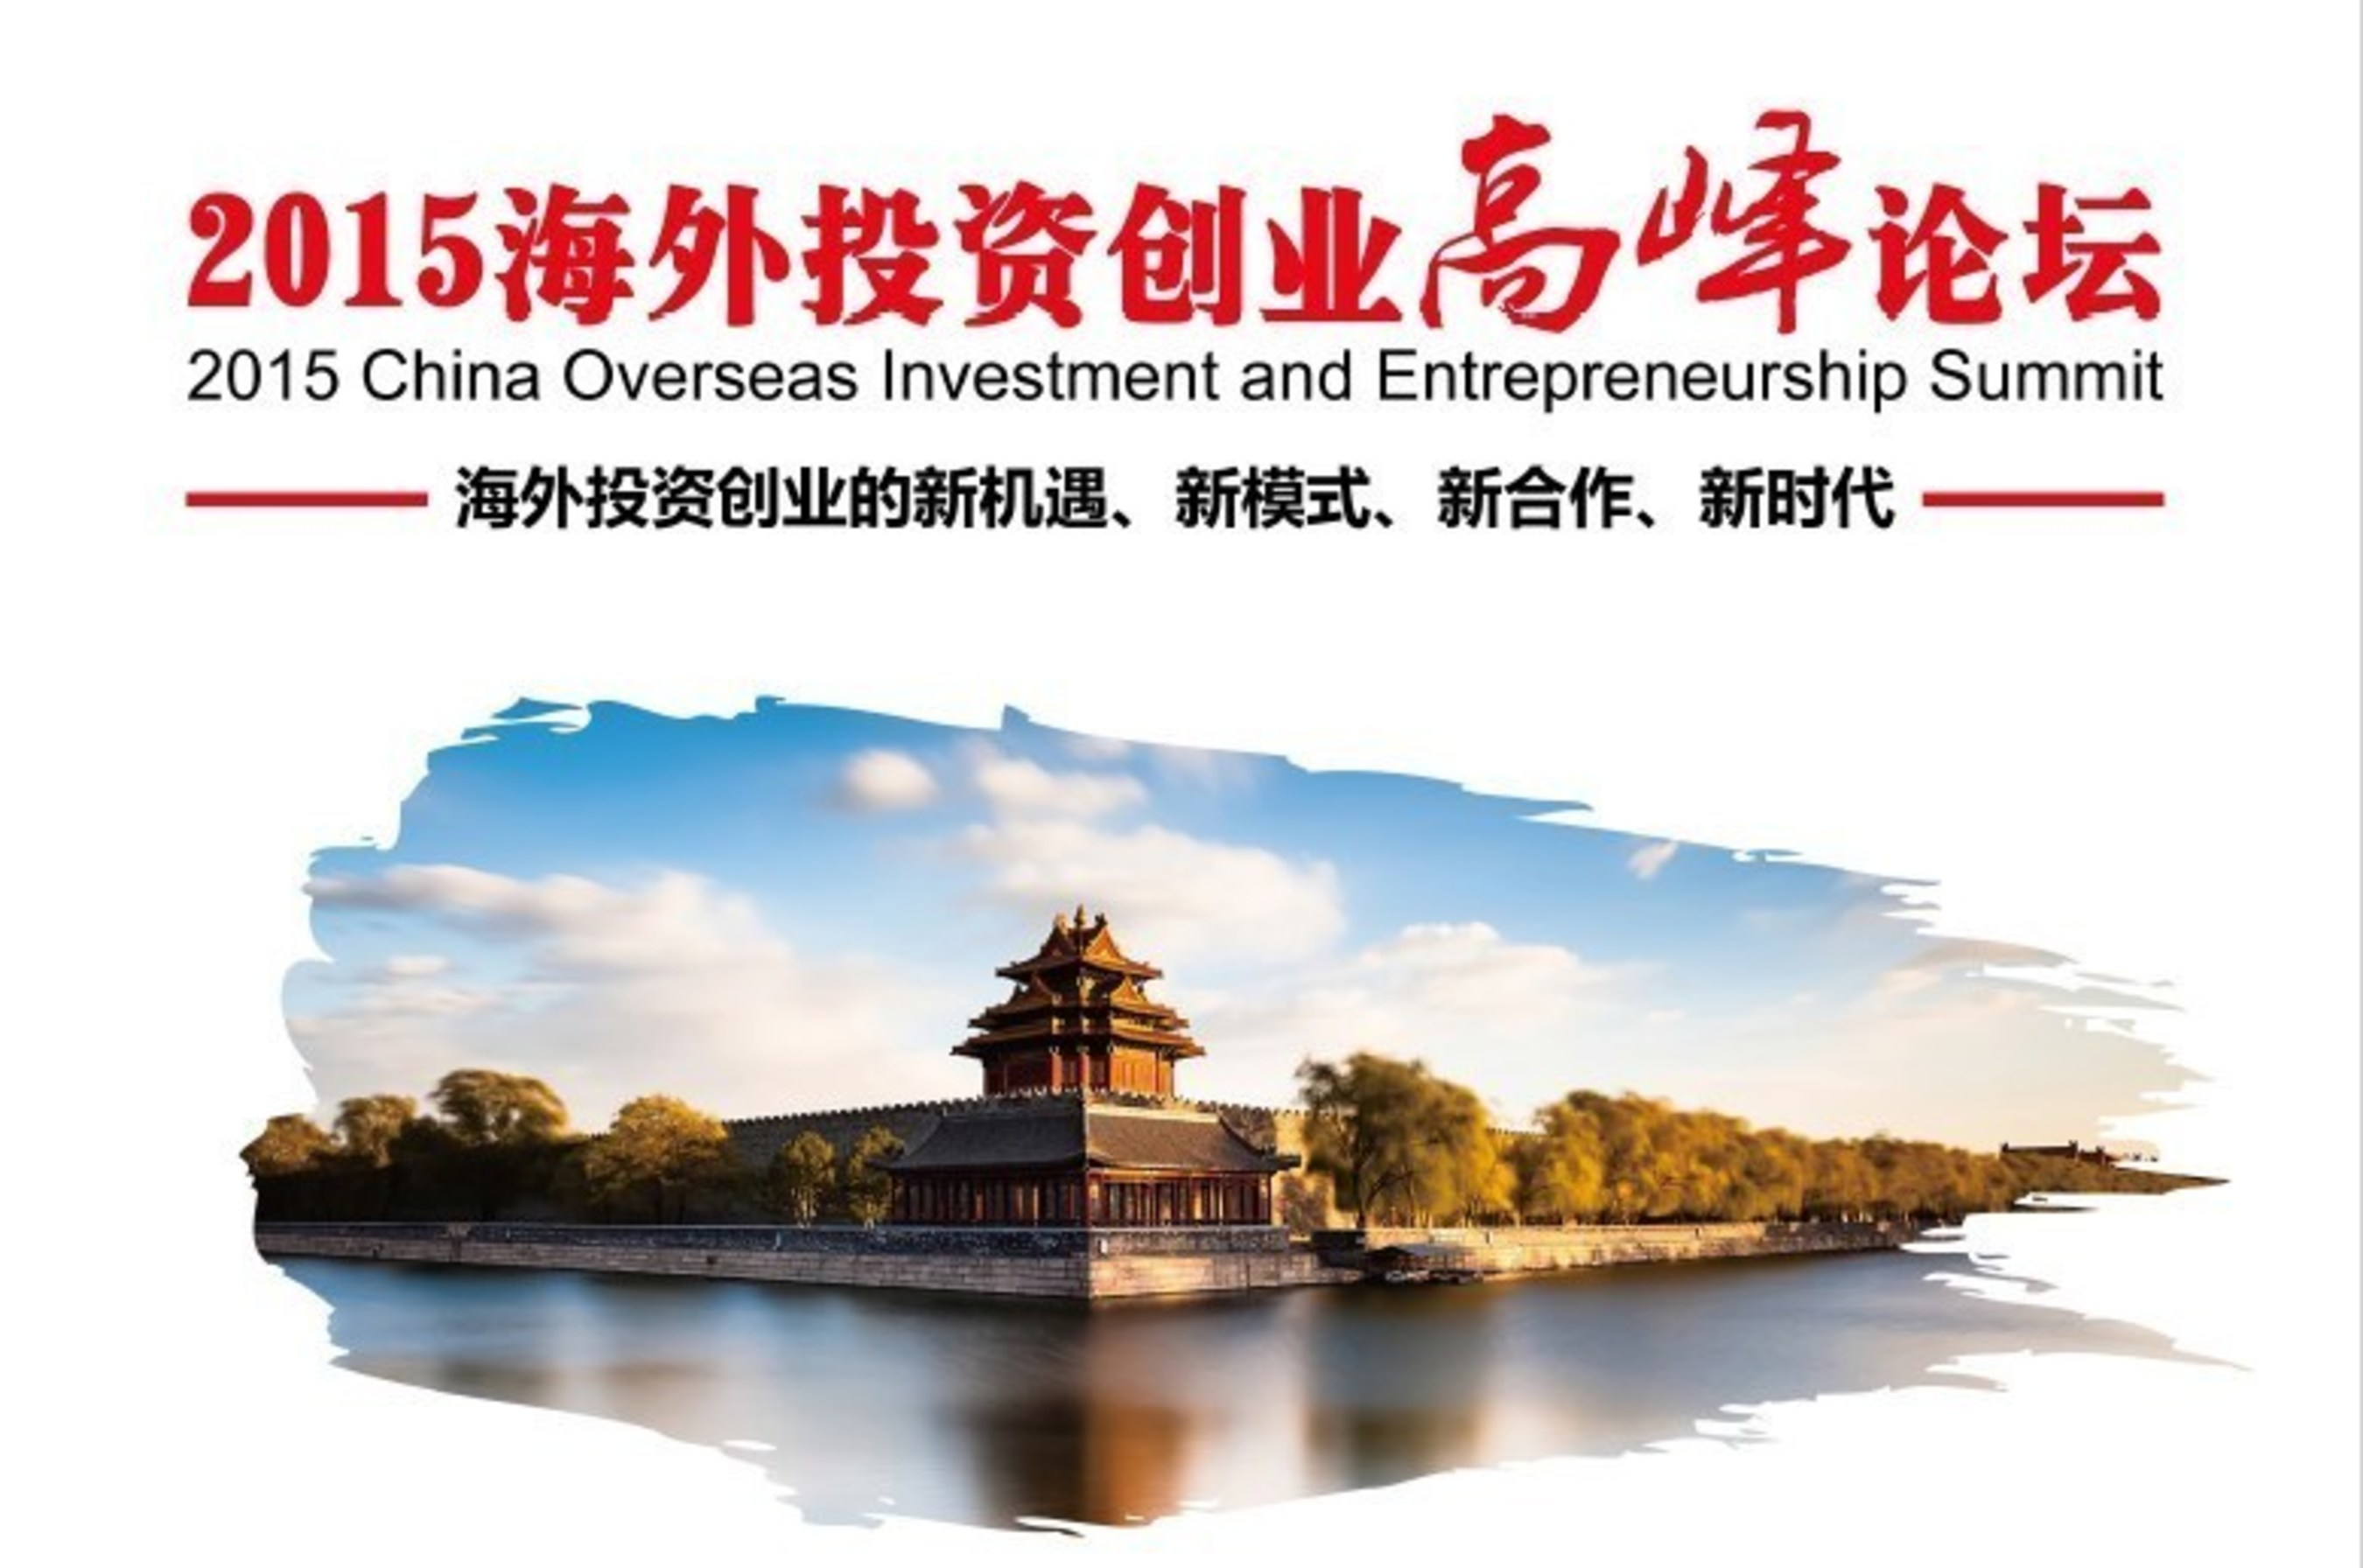 2015 China Overseas Investment and Entrepreneurship Summit